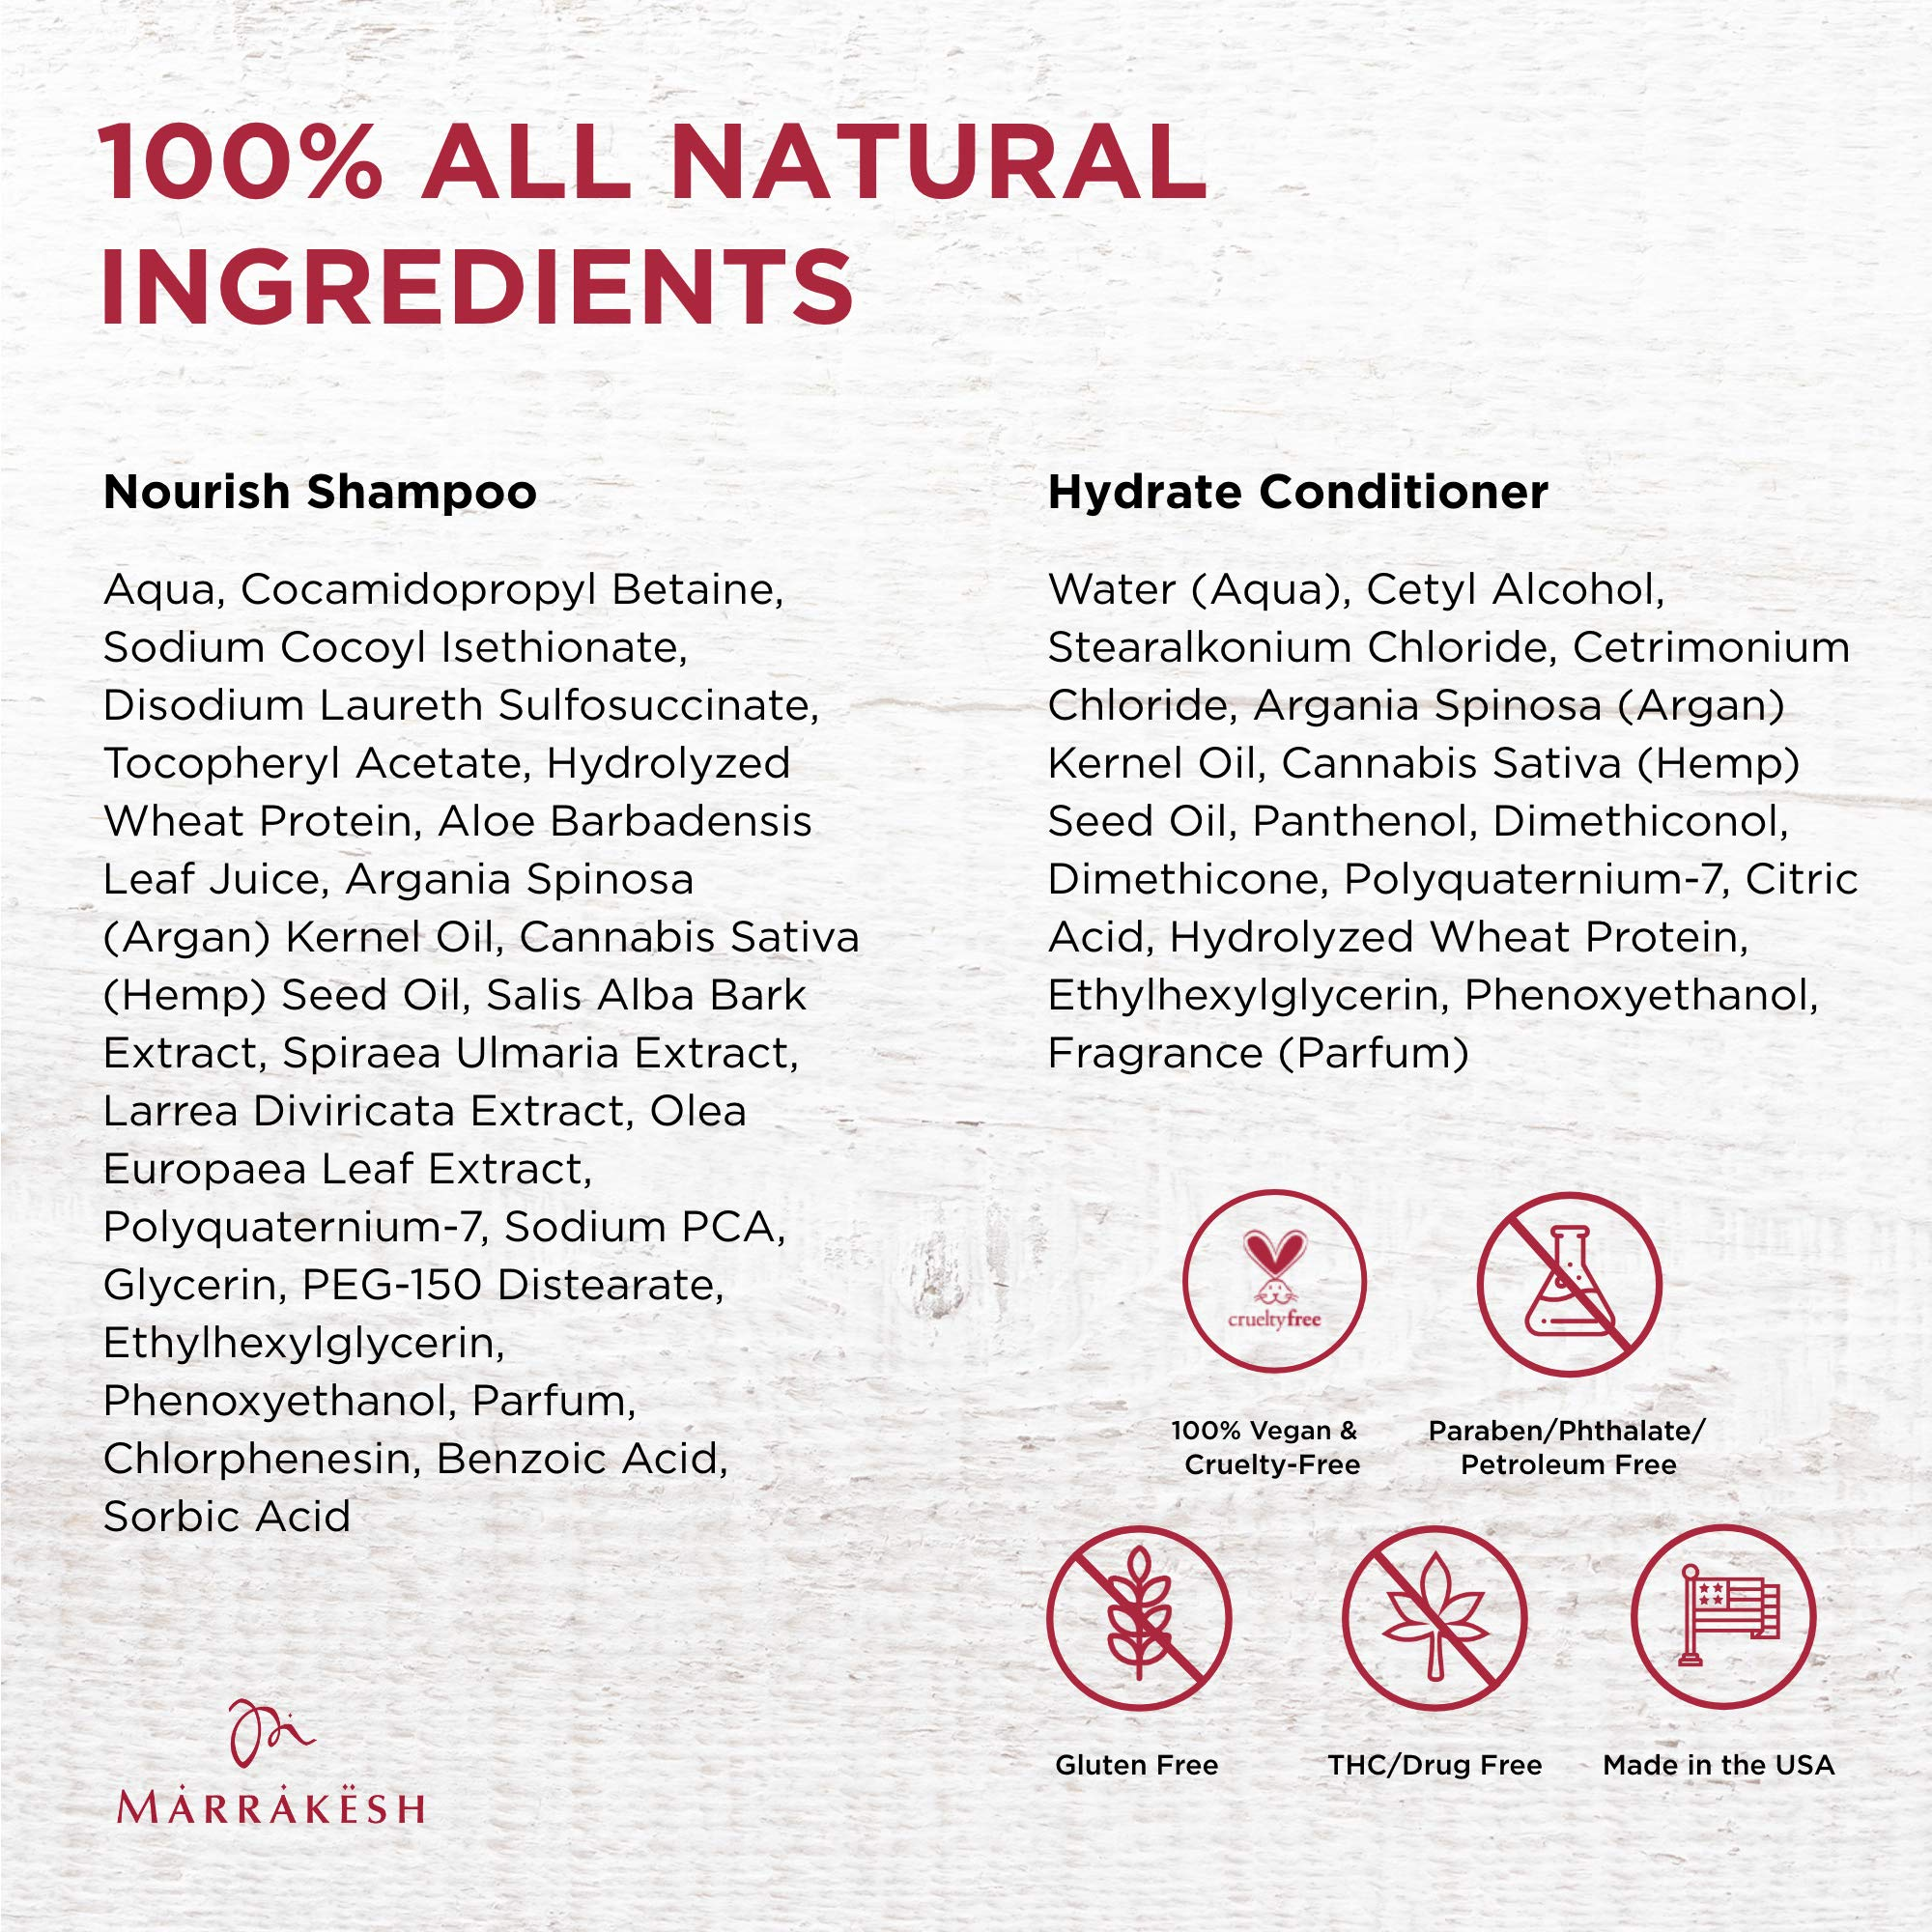 Marrakesh Nourish Shampoo + Hydrate Conditioner, Original Scent - 25 fl. oz. - Morrocan Argan Oil, Hemp Seed Oil - Clean & Moisturize Hair for a Silky, Shiny Look - Vegan, Cruelty Free